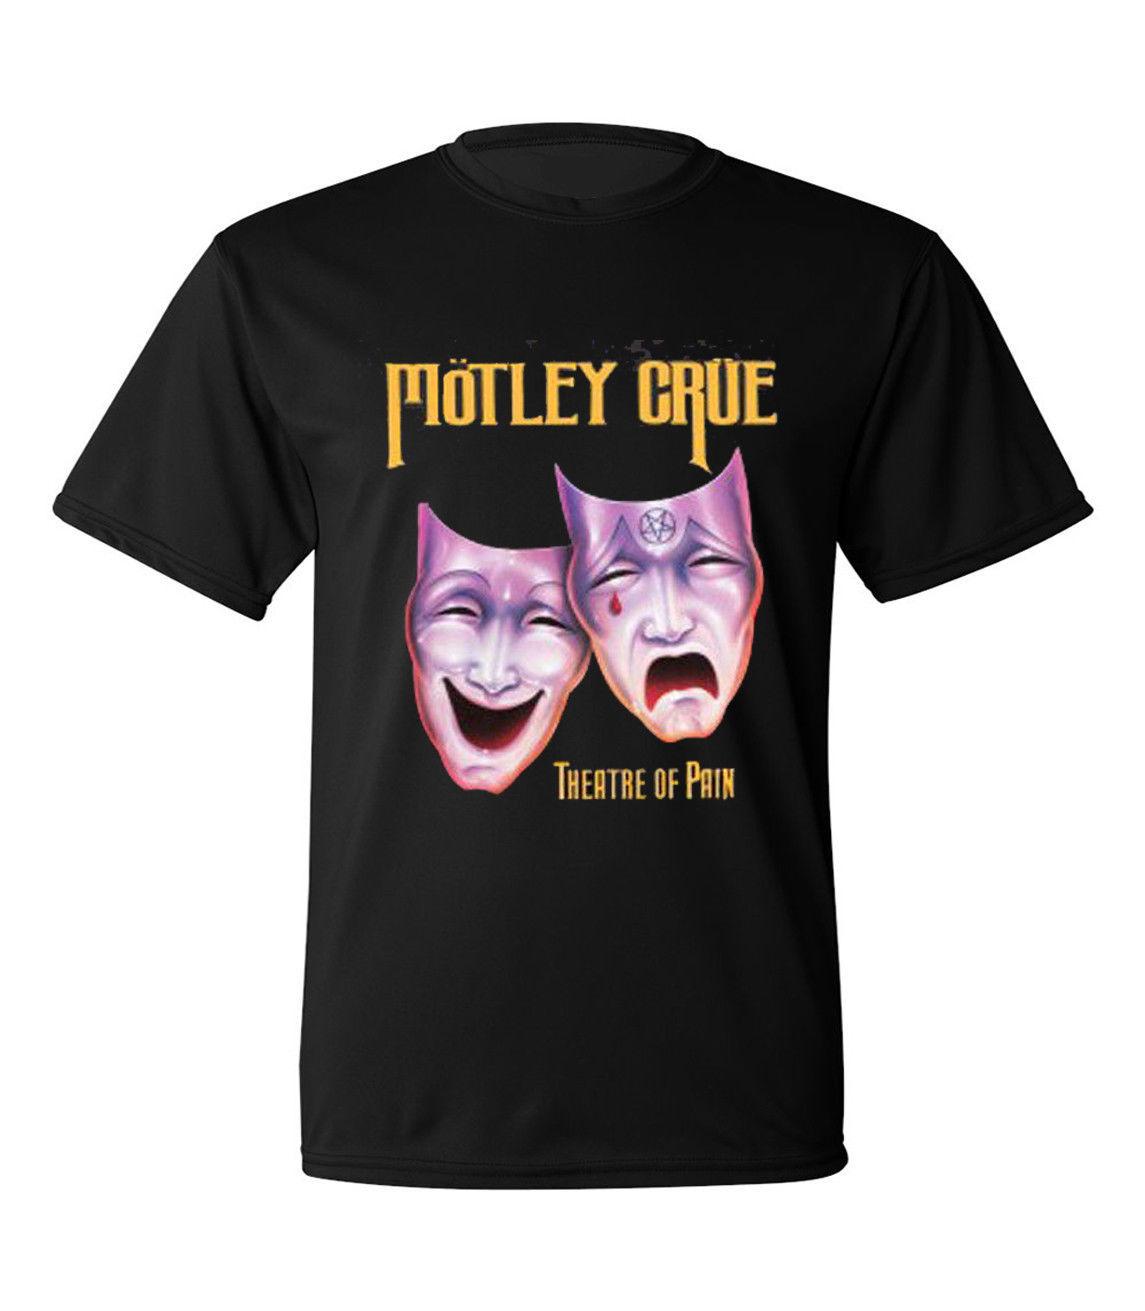 MOTLEY CRUE Theatre of Pain Rock Band Men/'s Black T-Shirt Size S to 3XL